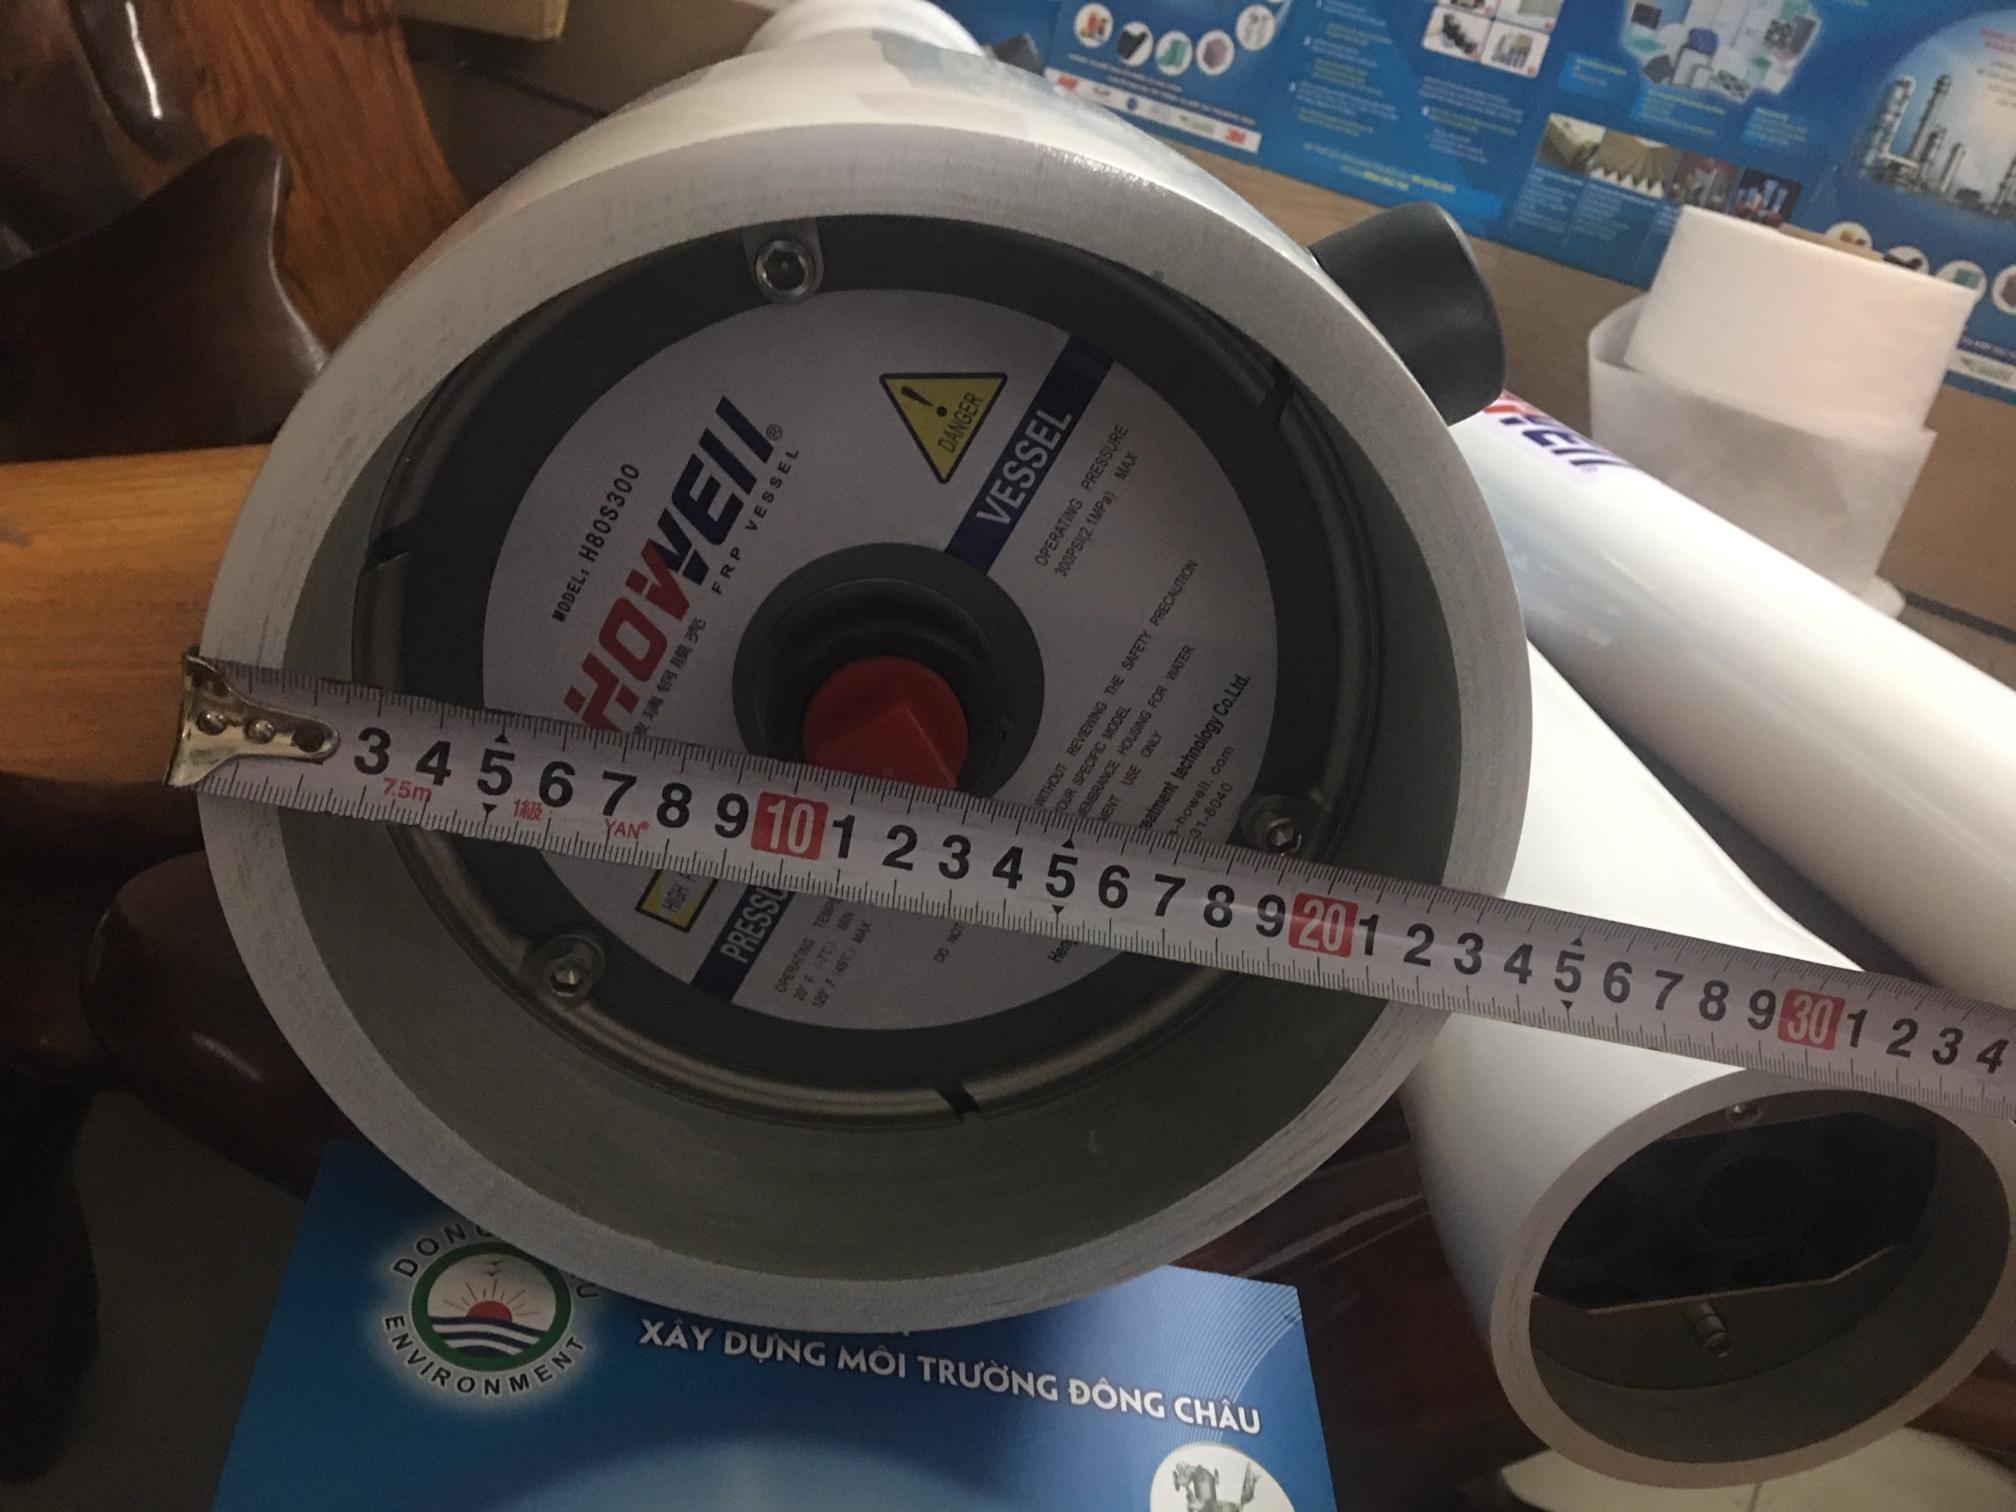 Vỏ composite chứa màng lọc RO 8040